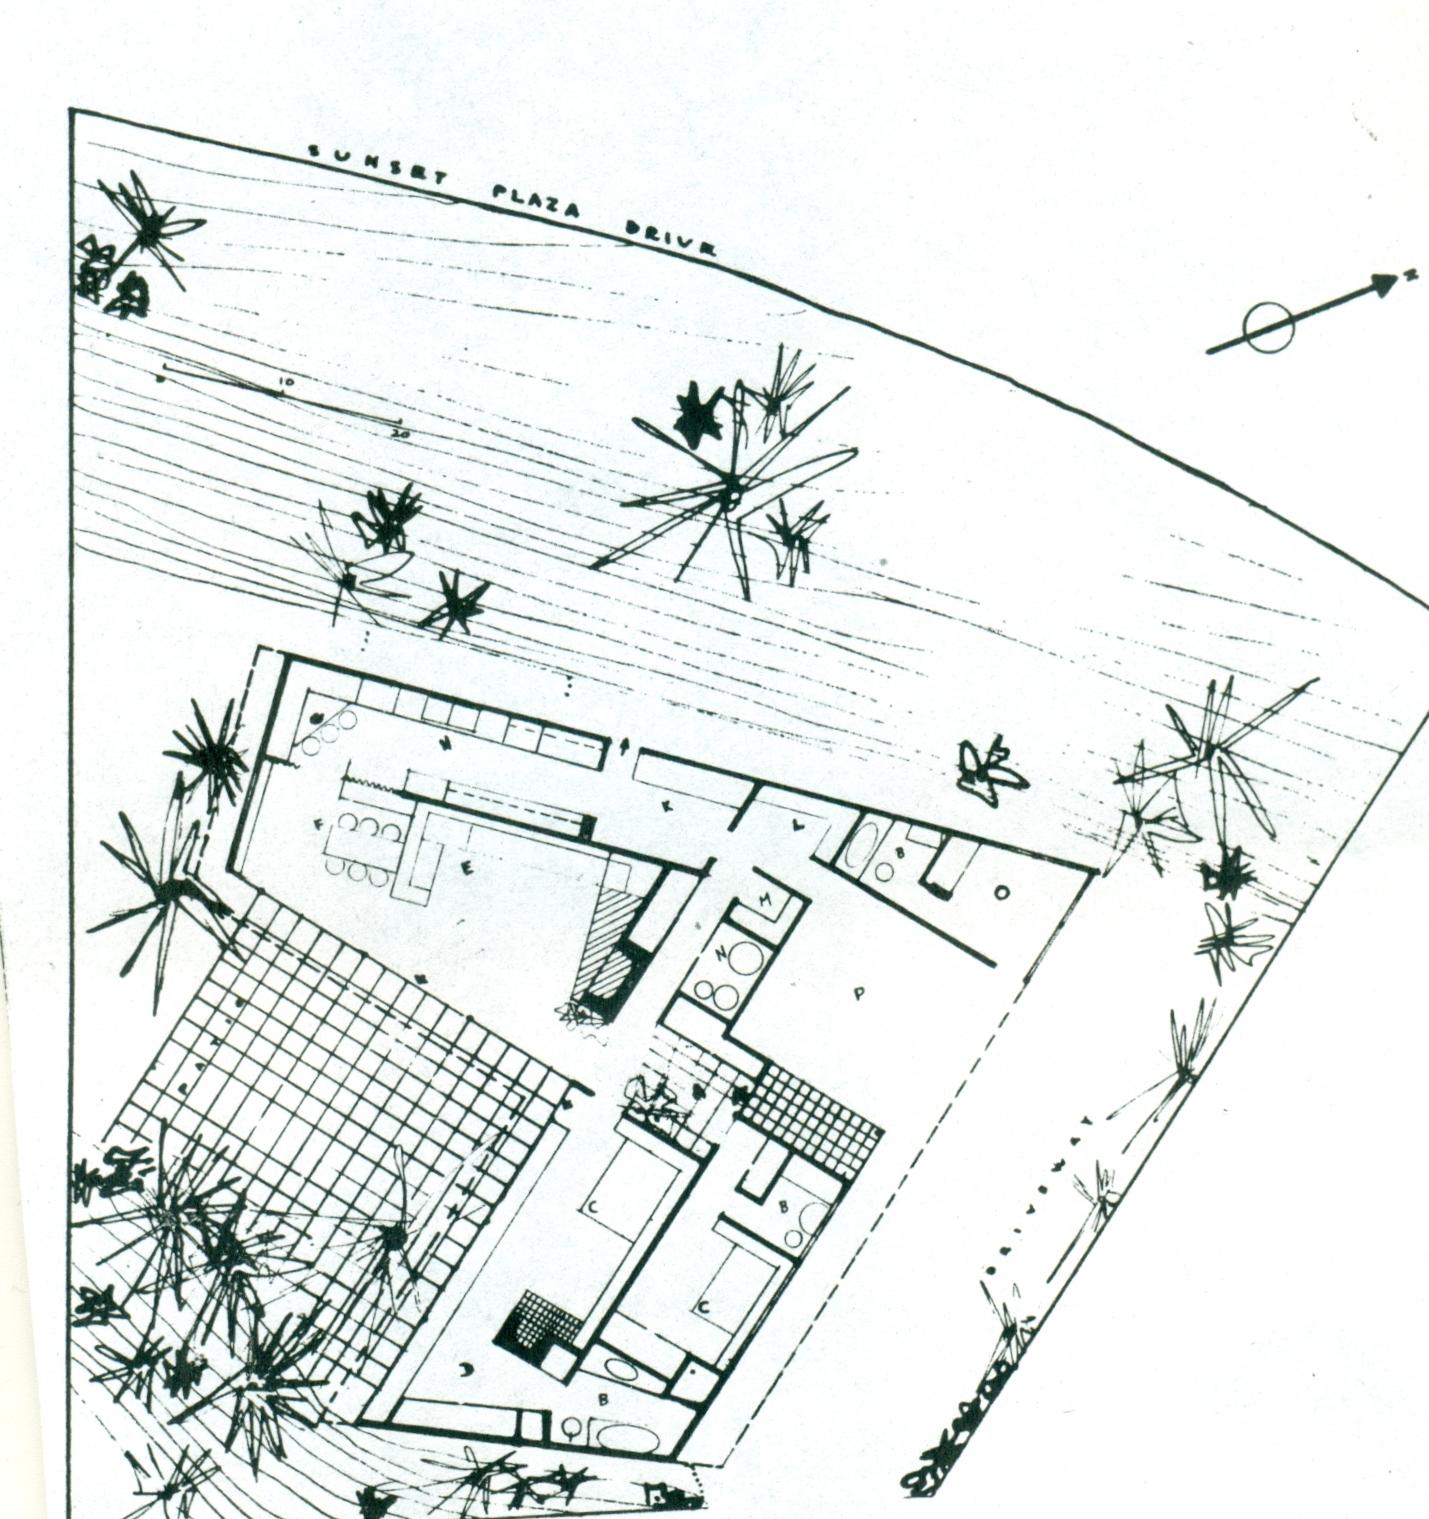 Usmodernist soriano for Pentagon shaped house plans